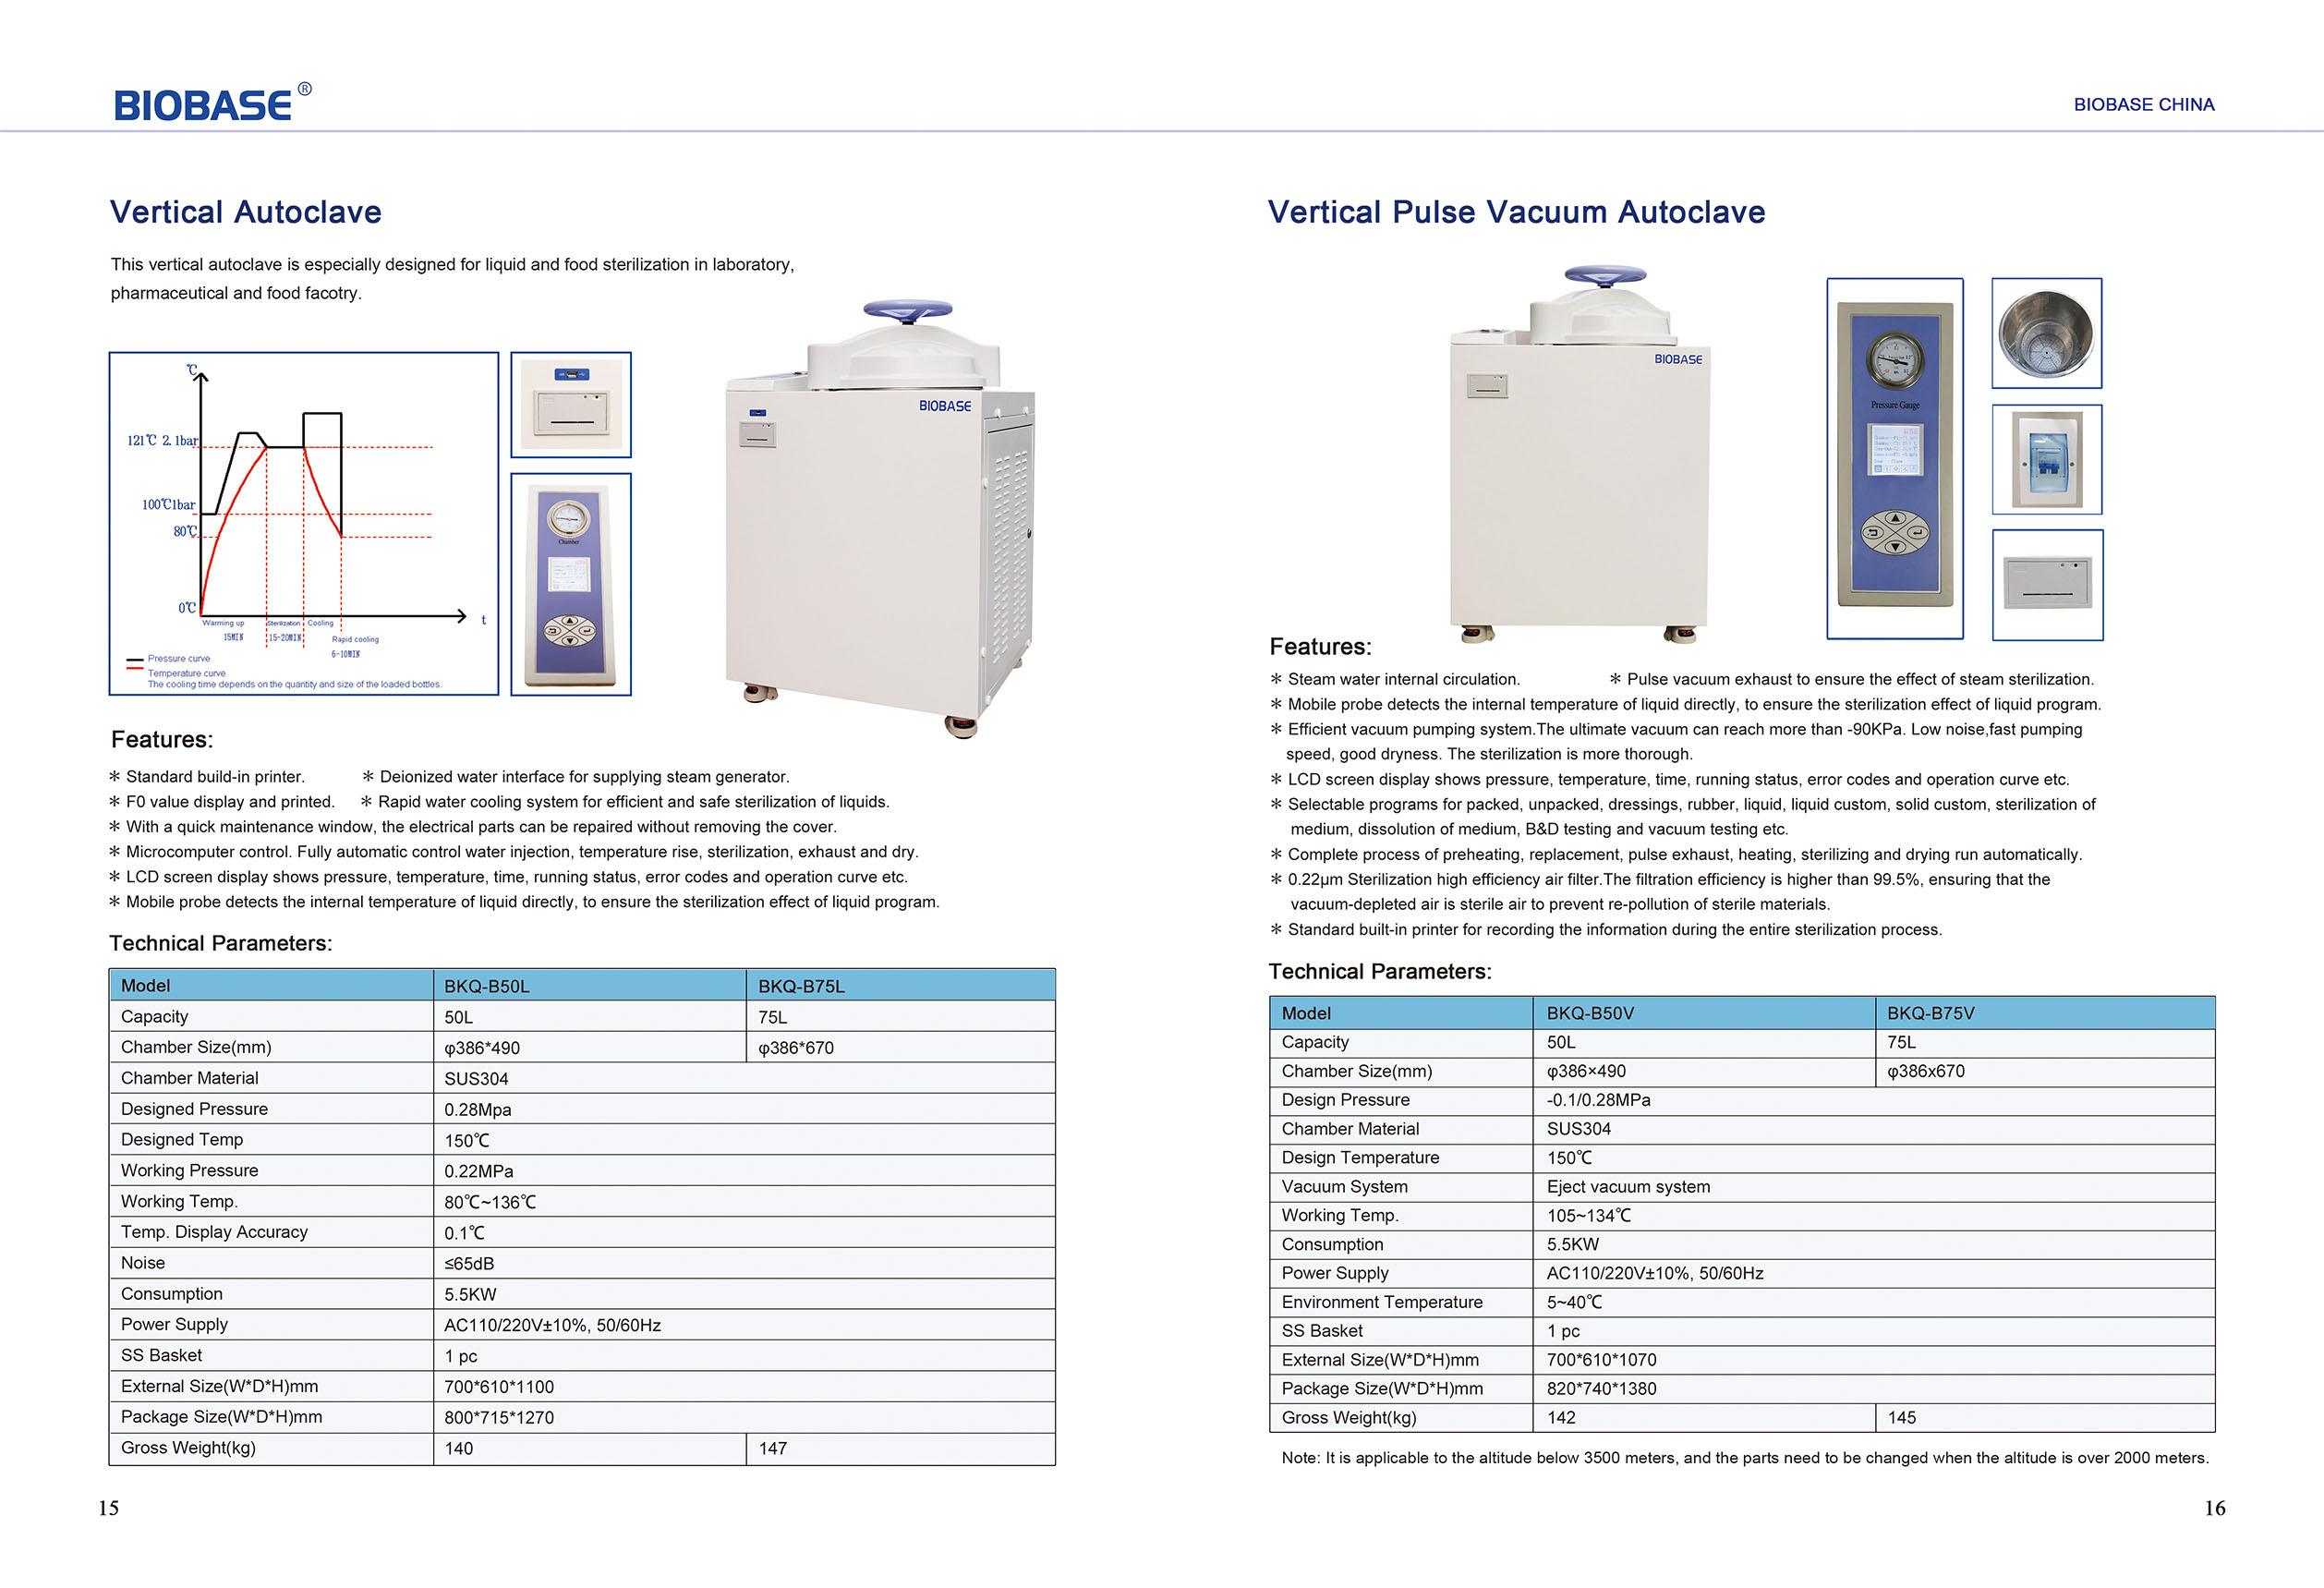 vertkalni-pulse-vacuum-autoclav-biobase